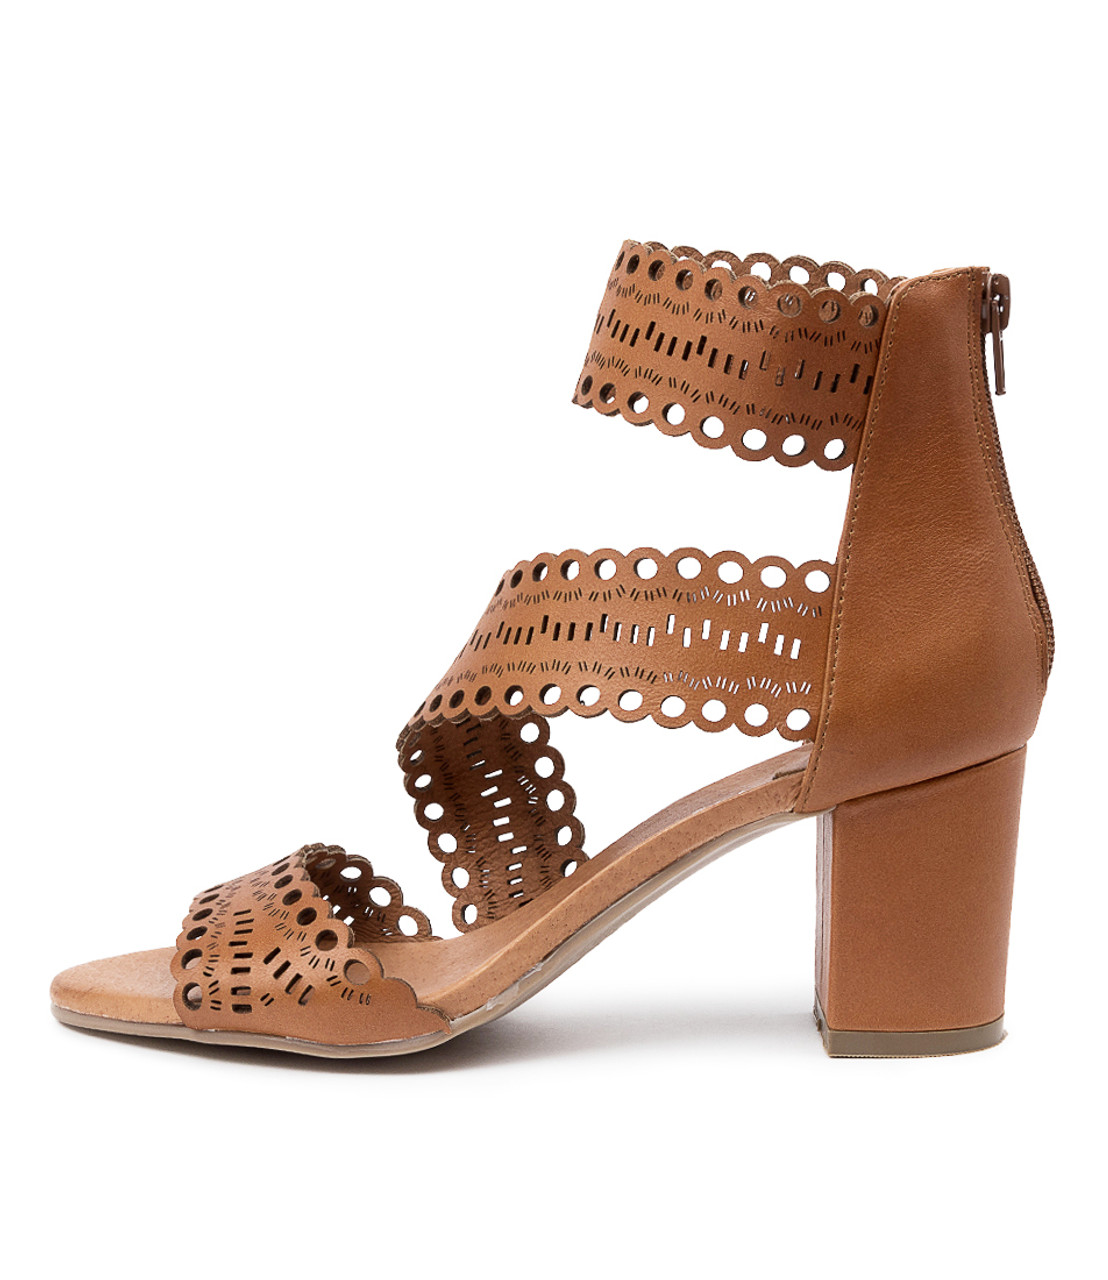 SHEP Sandals Dark Tan Leather Django and Juliette